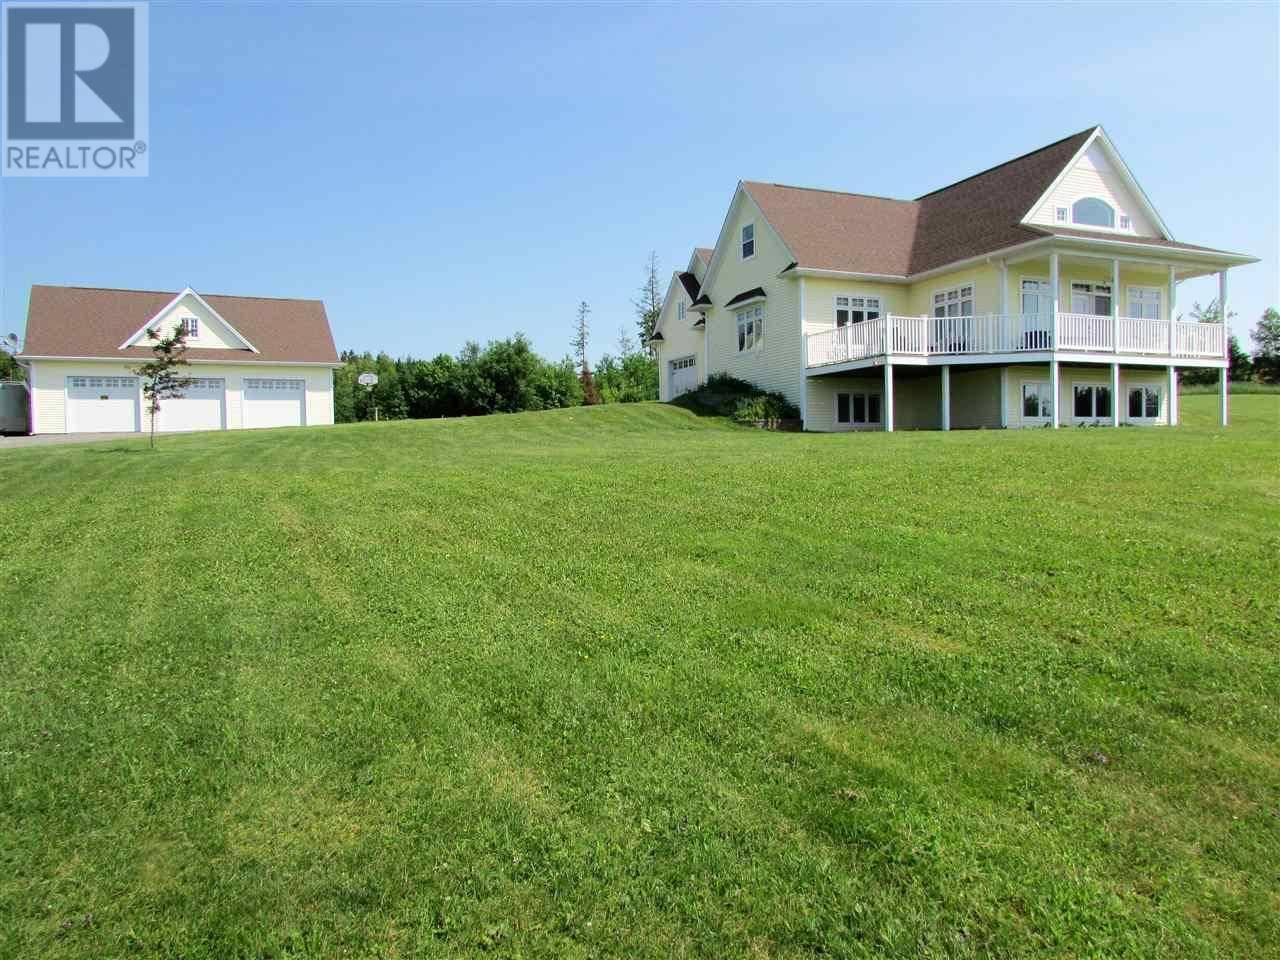 House for sale at 515 Staples Brook Rd Debert Nova Scotia - MLS: 201916673